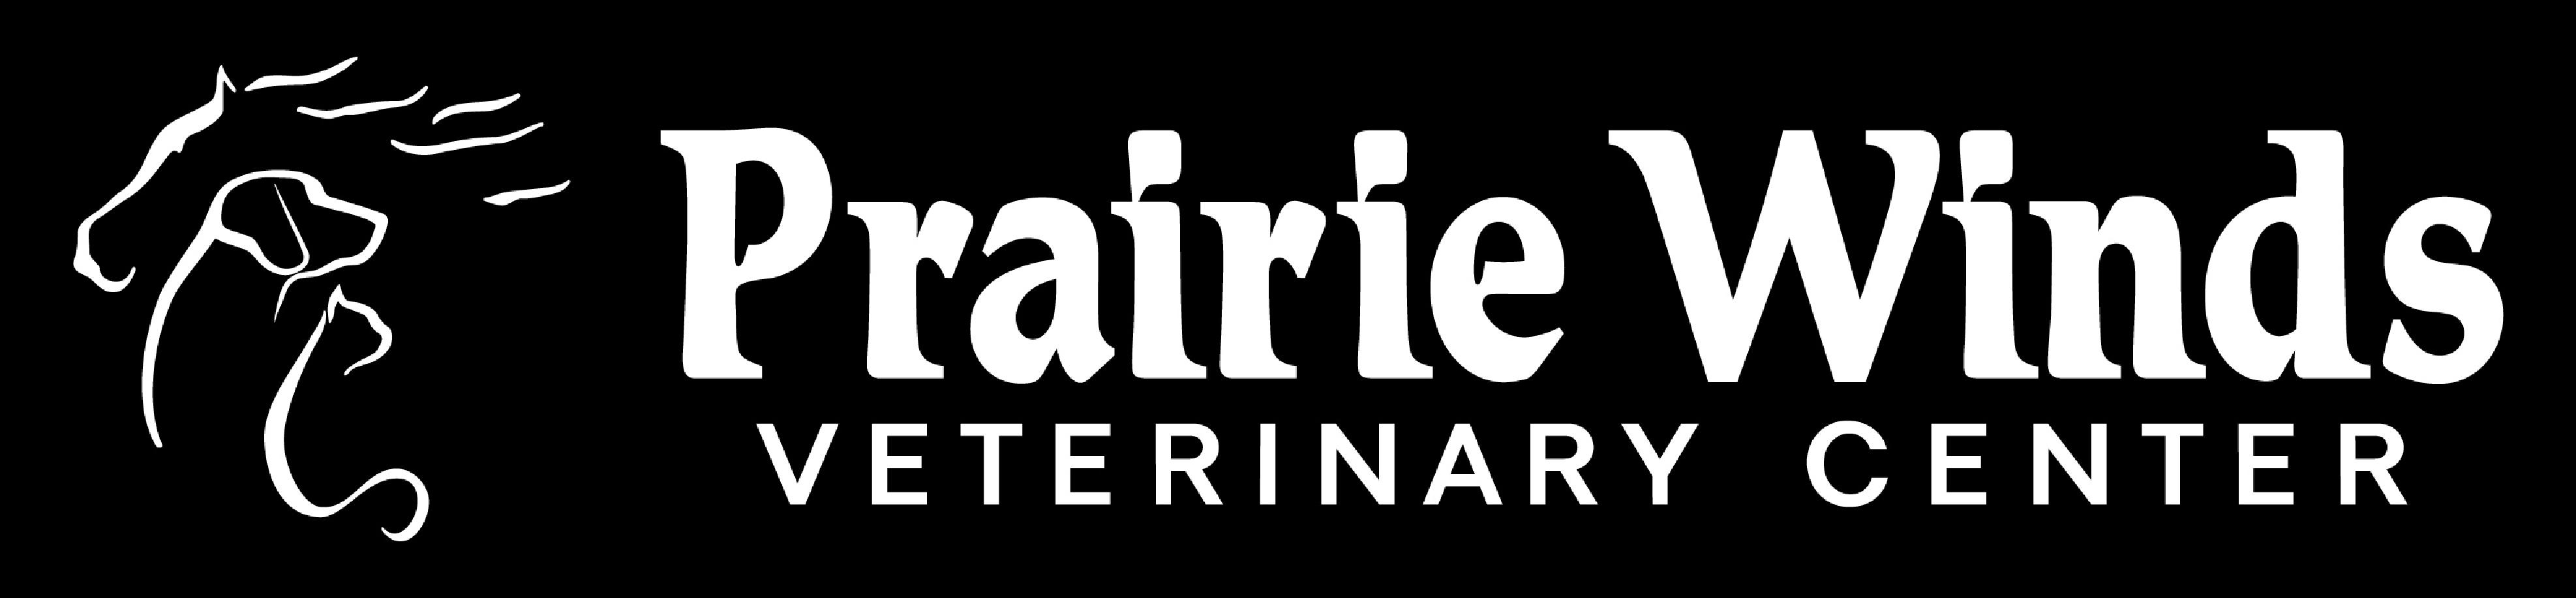 Prairie Winds Veterinary Center